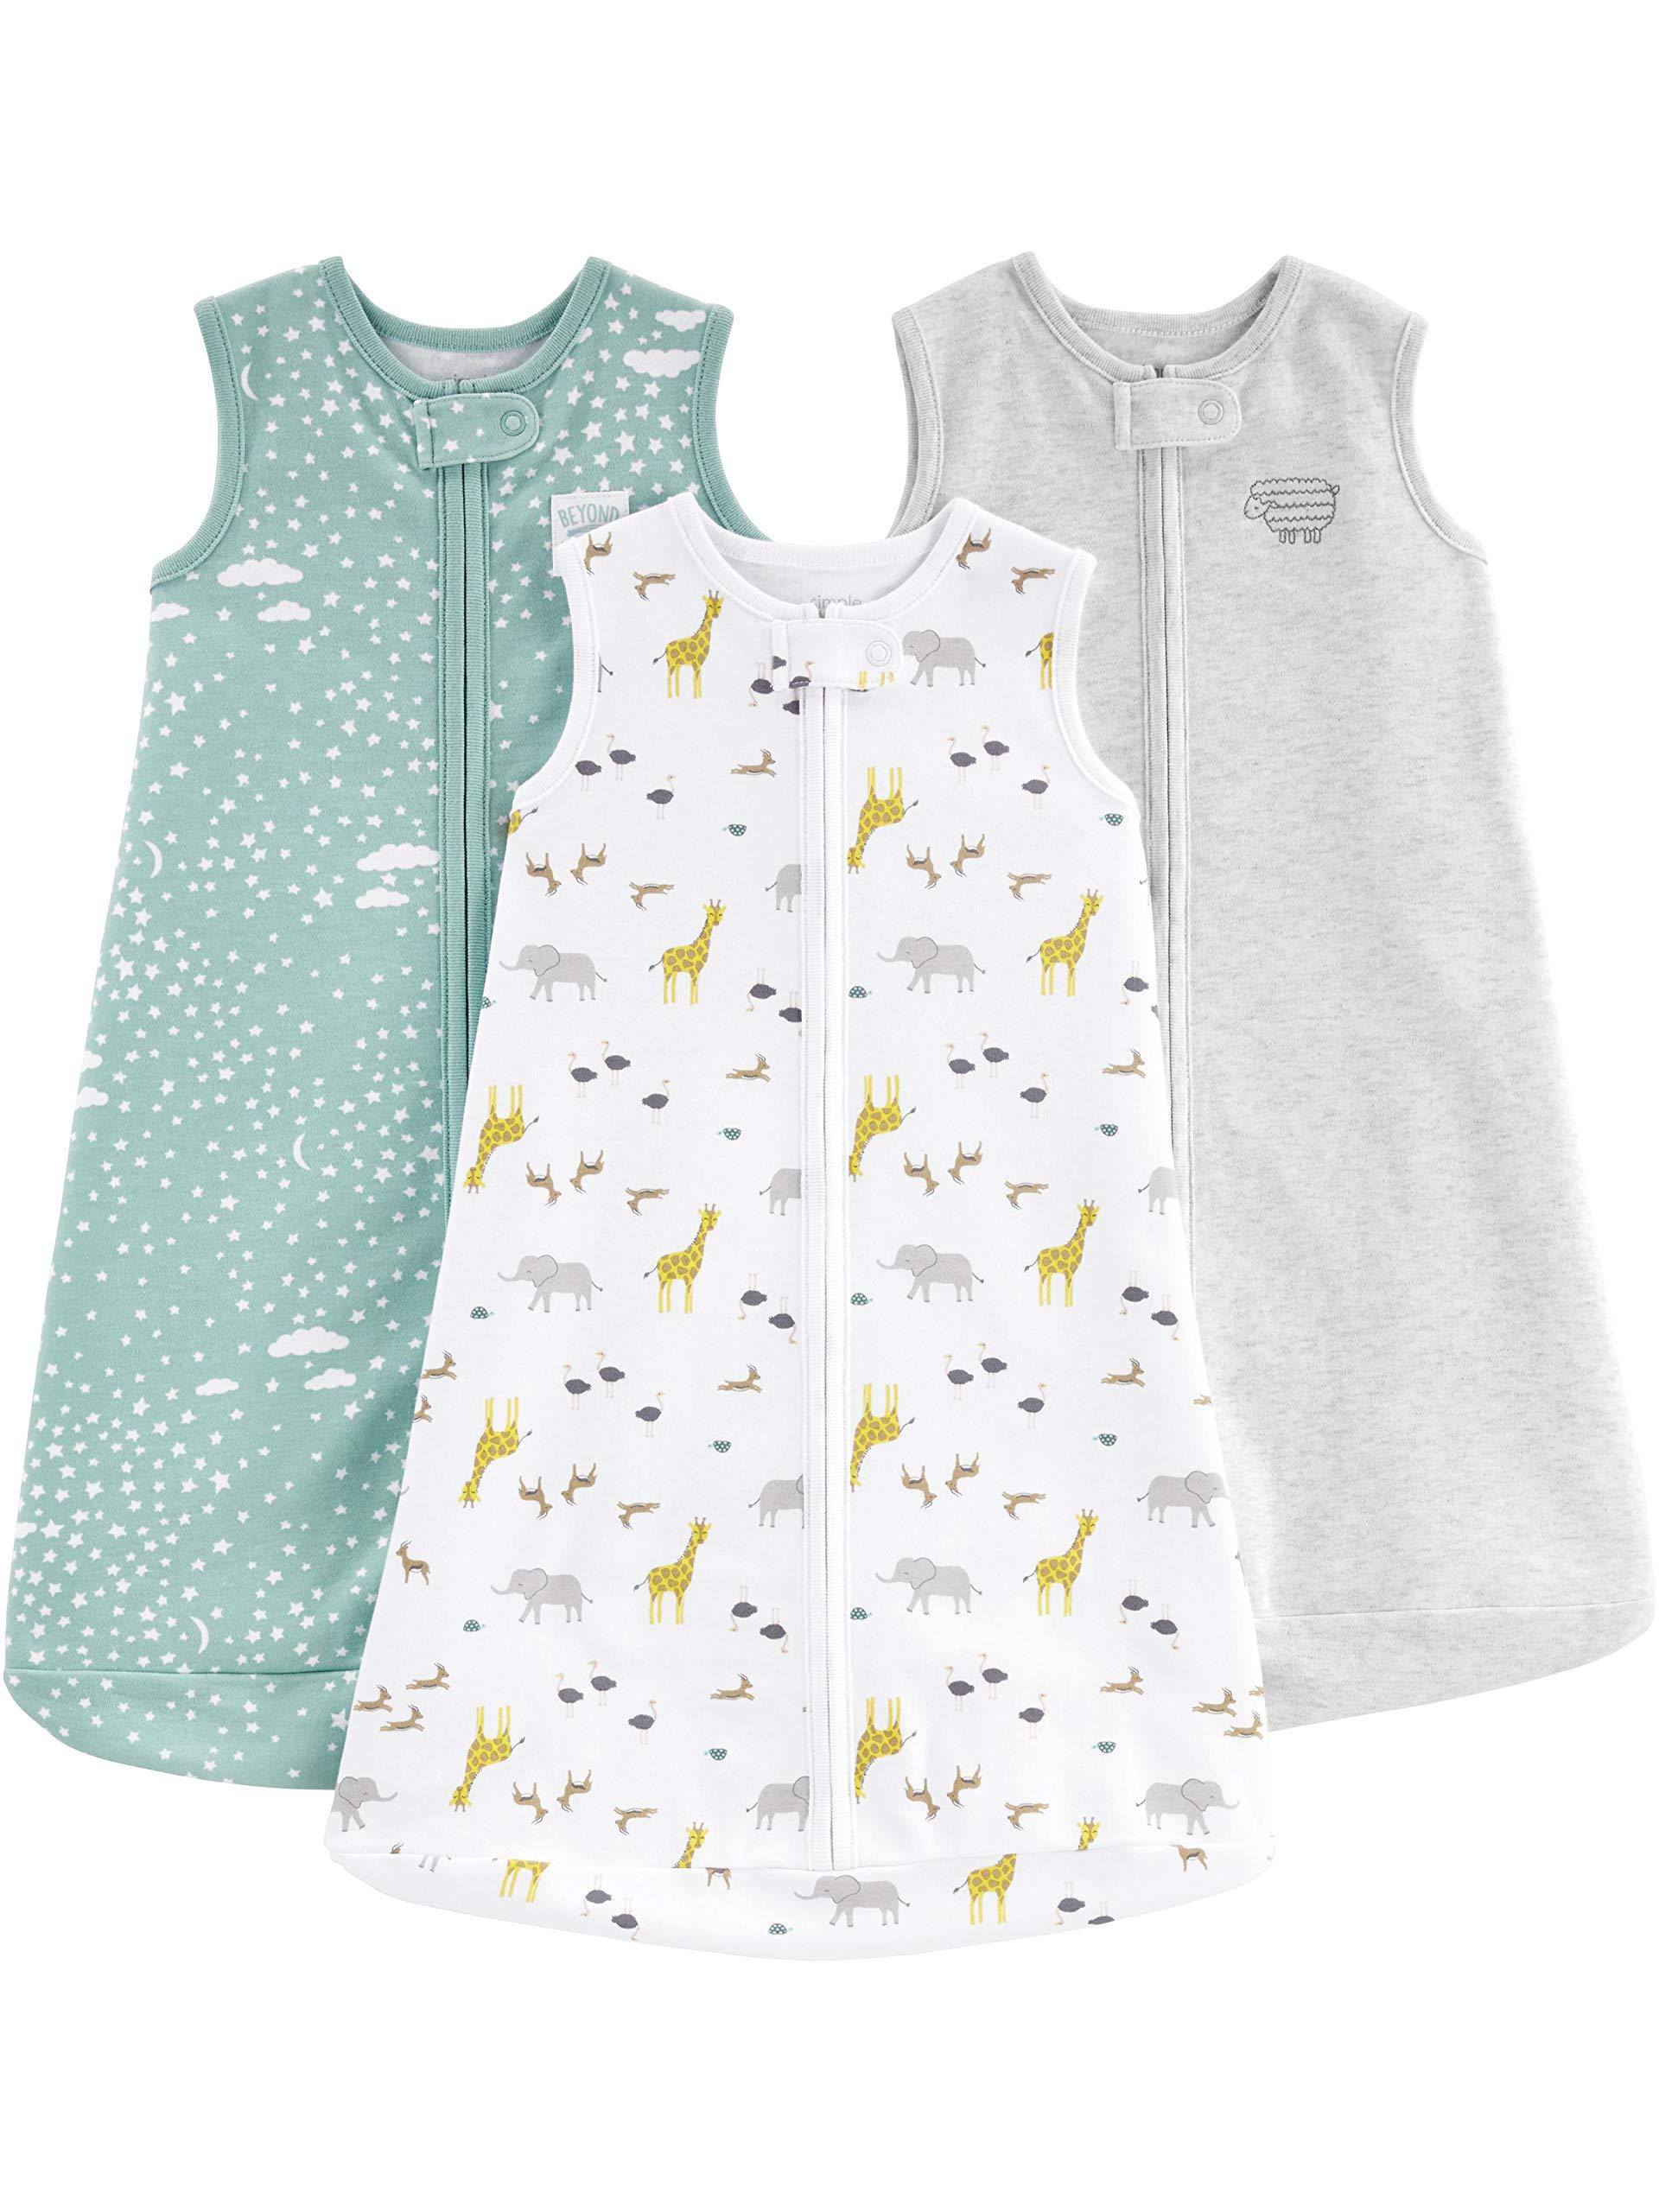 Simple Joys by Carter's Baby 3-Pack Cotton Sleeveless Sleepbag Wearable Blanket, Grey/Mint/Animals Green, Medium: 6-9 Months, 12.5-21 lbs